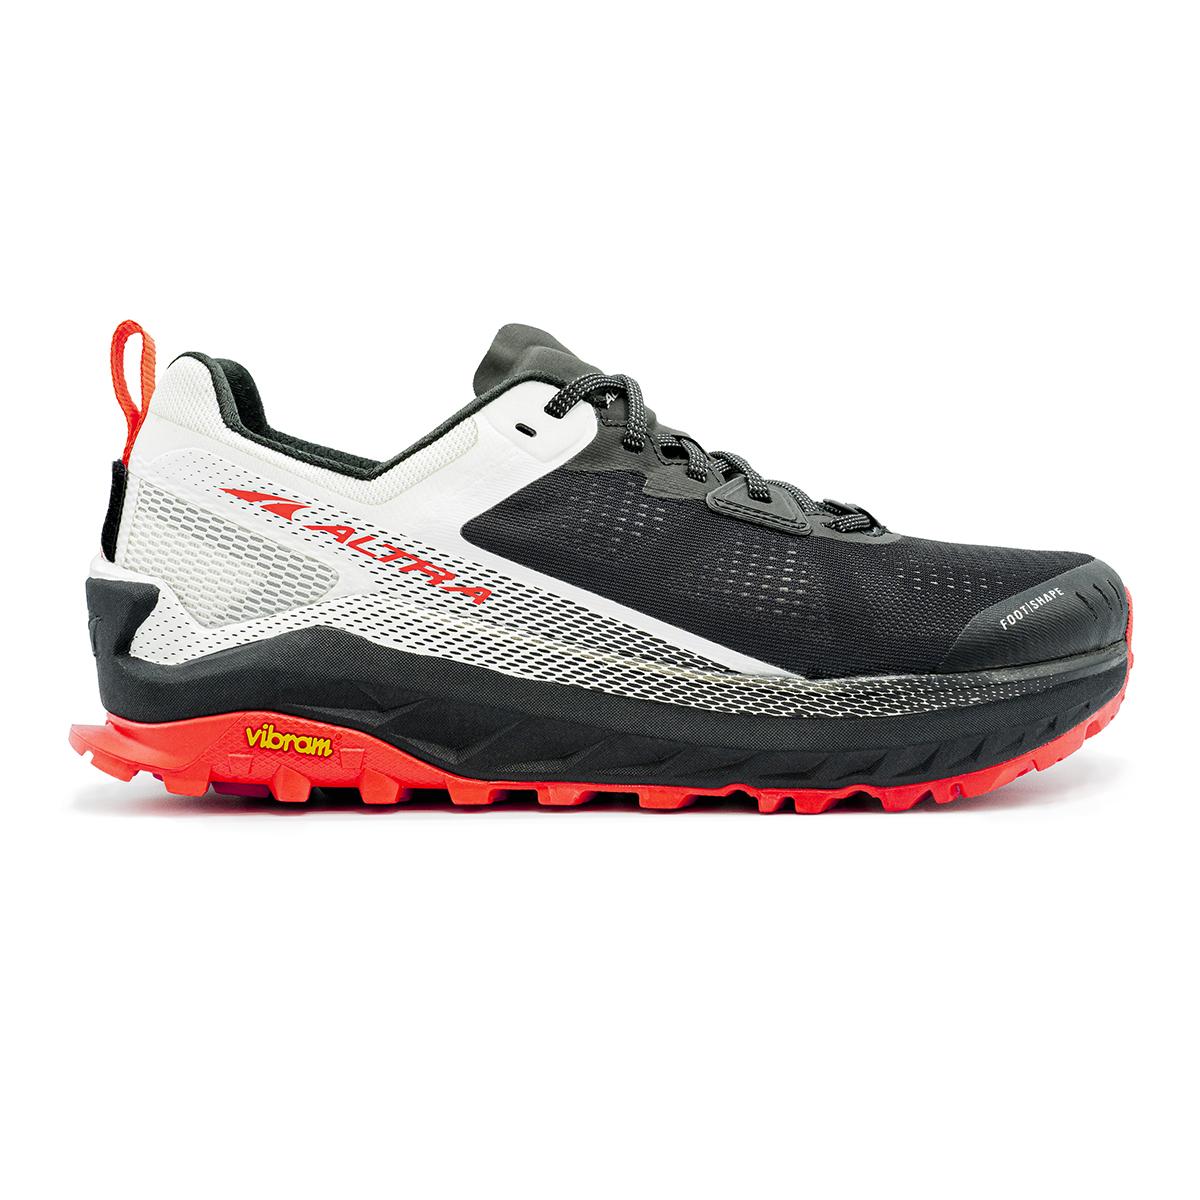 Men's Altra Olympus 4 Trail Running Shoe - Color: Black/White - Size: 12 - Width: Regular, Black/White, large, image 1